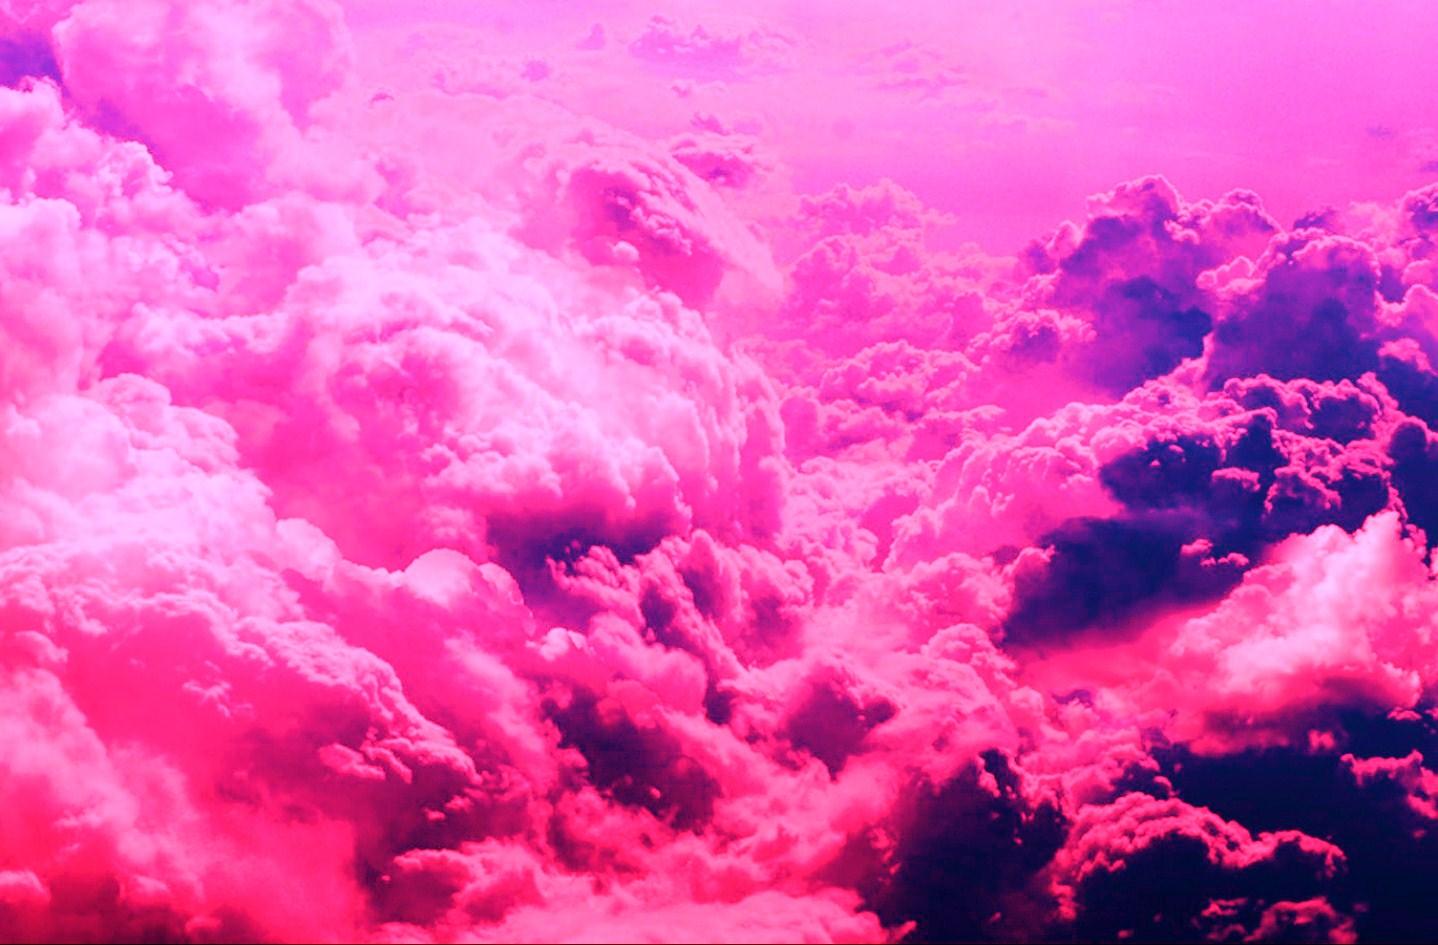 tumblr static tumblr static pink clouds background 1438 x 945 id 1438x945